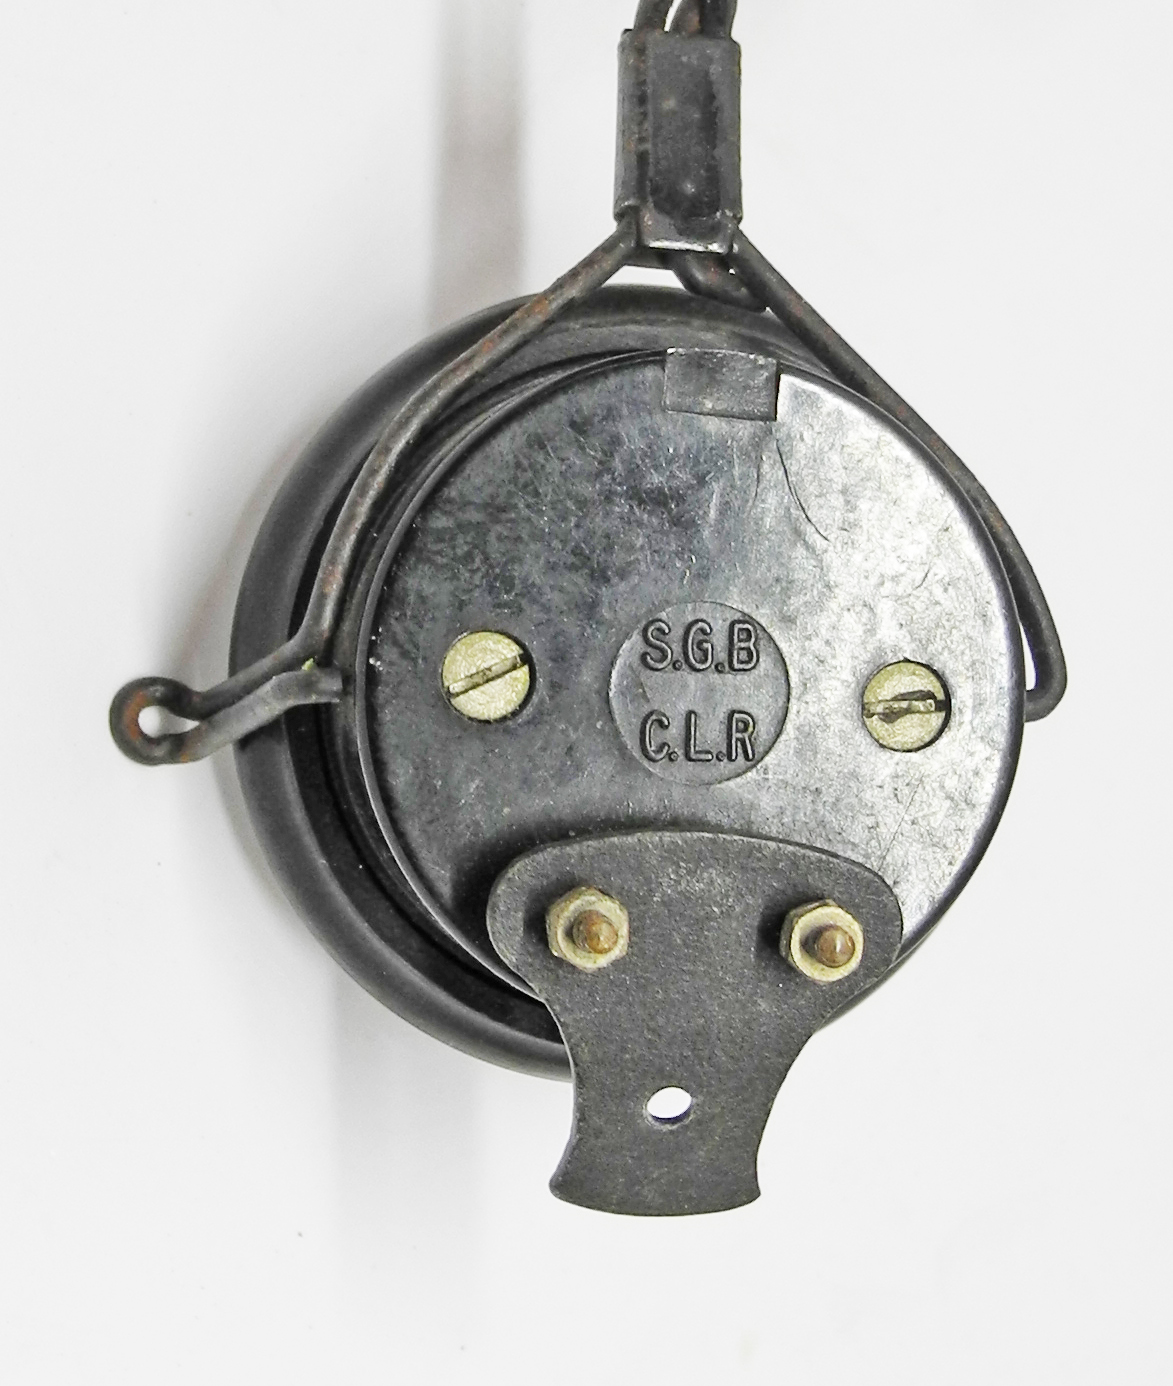 WWII Canadian radio receivers